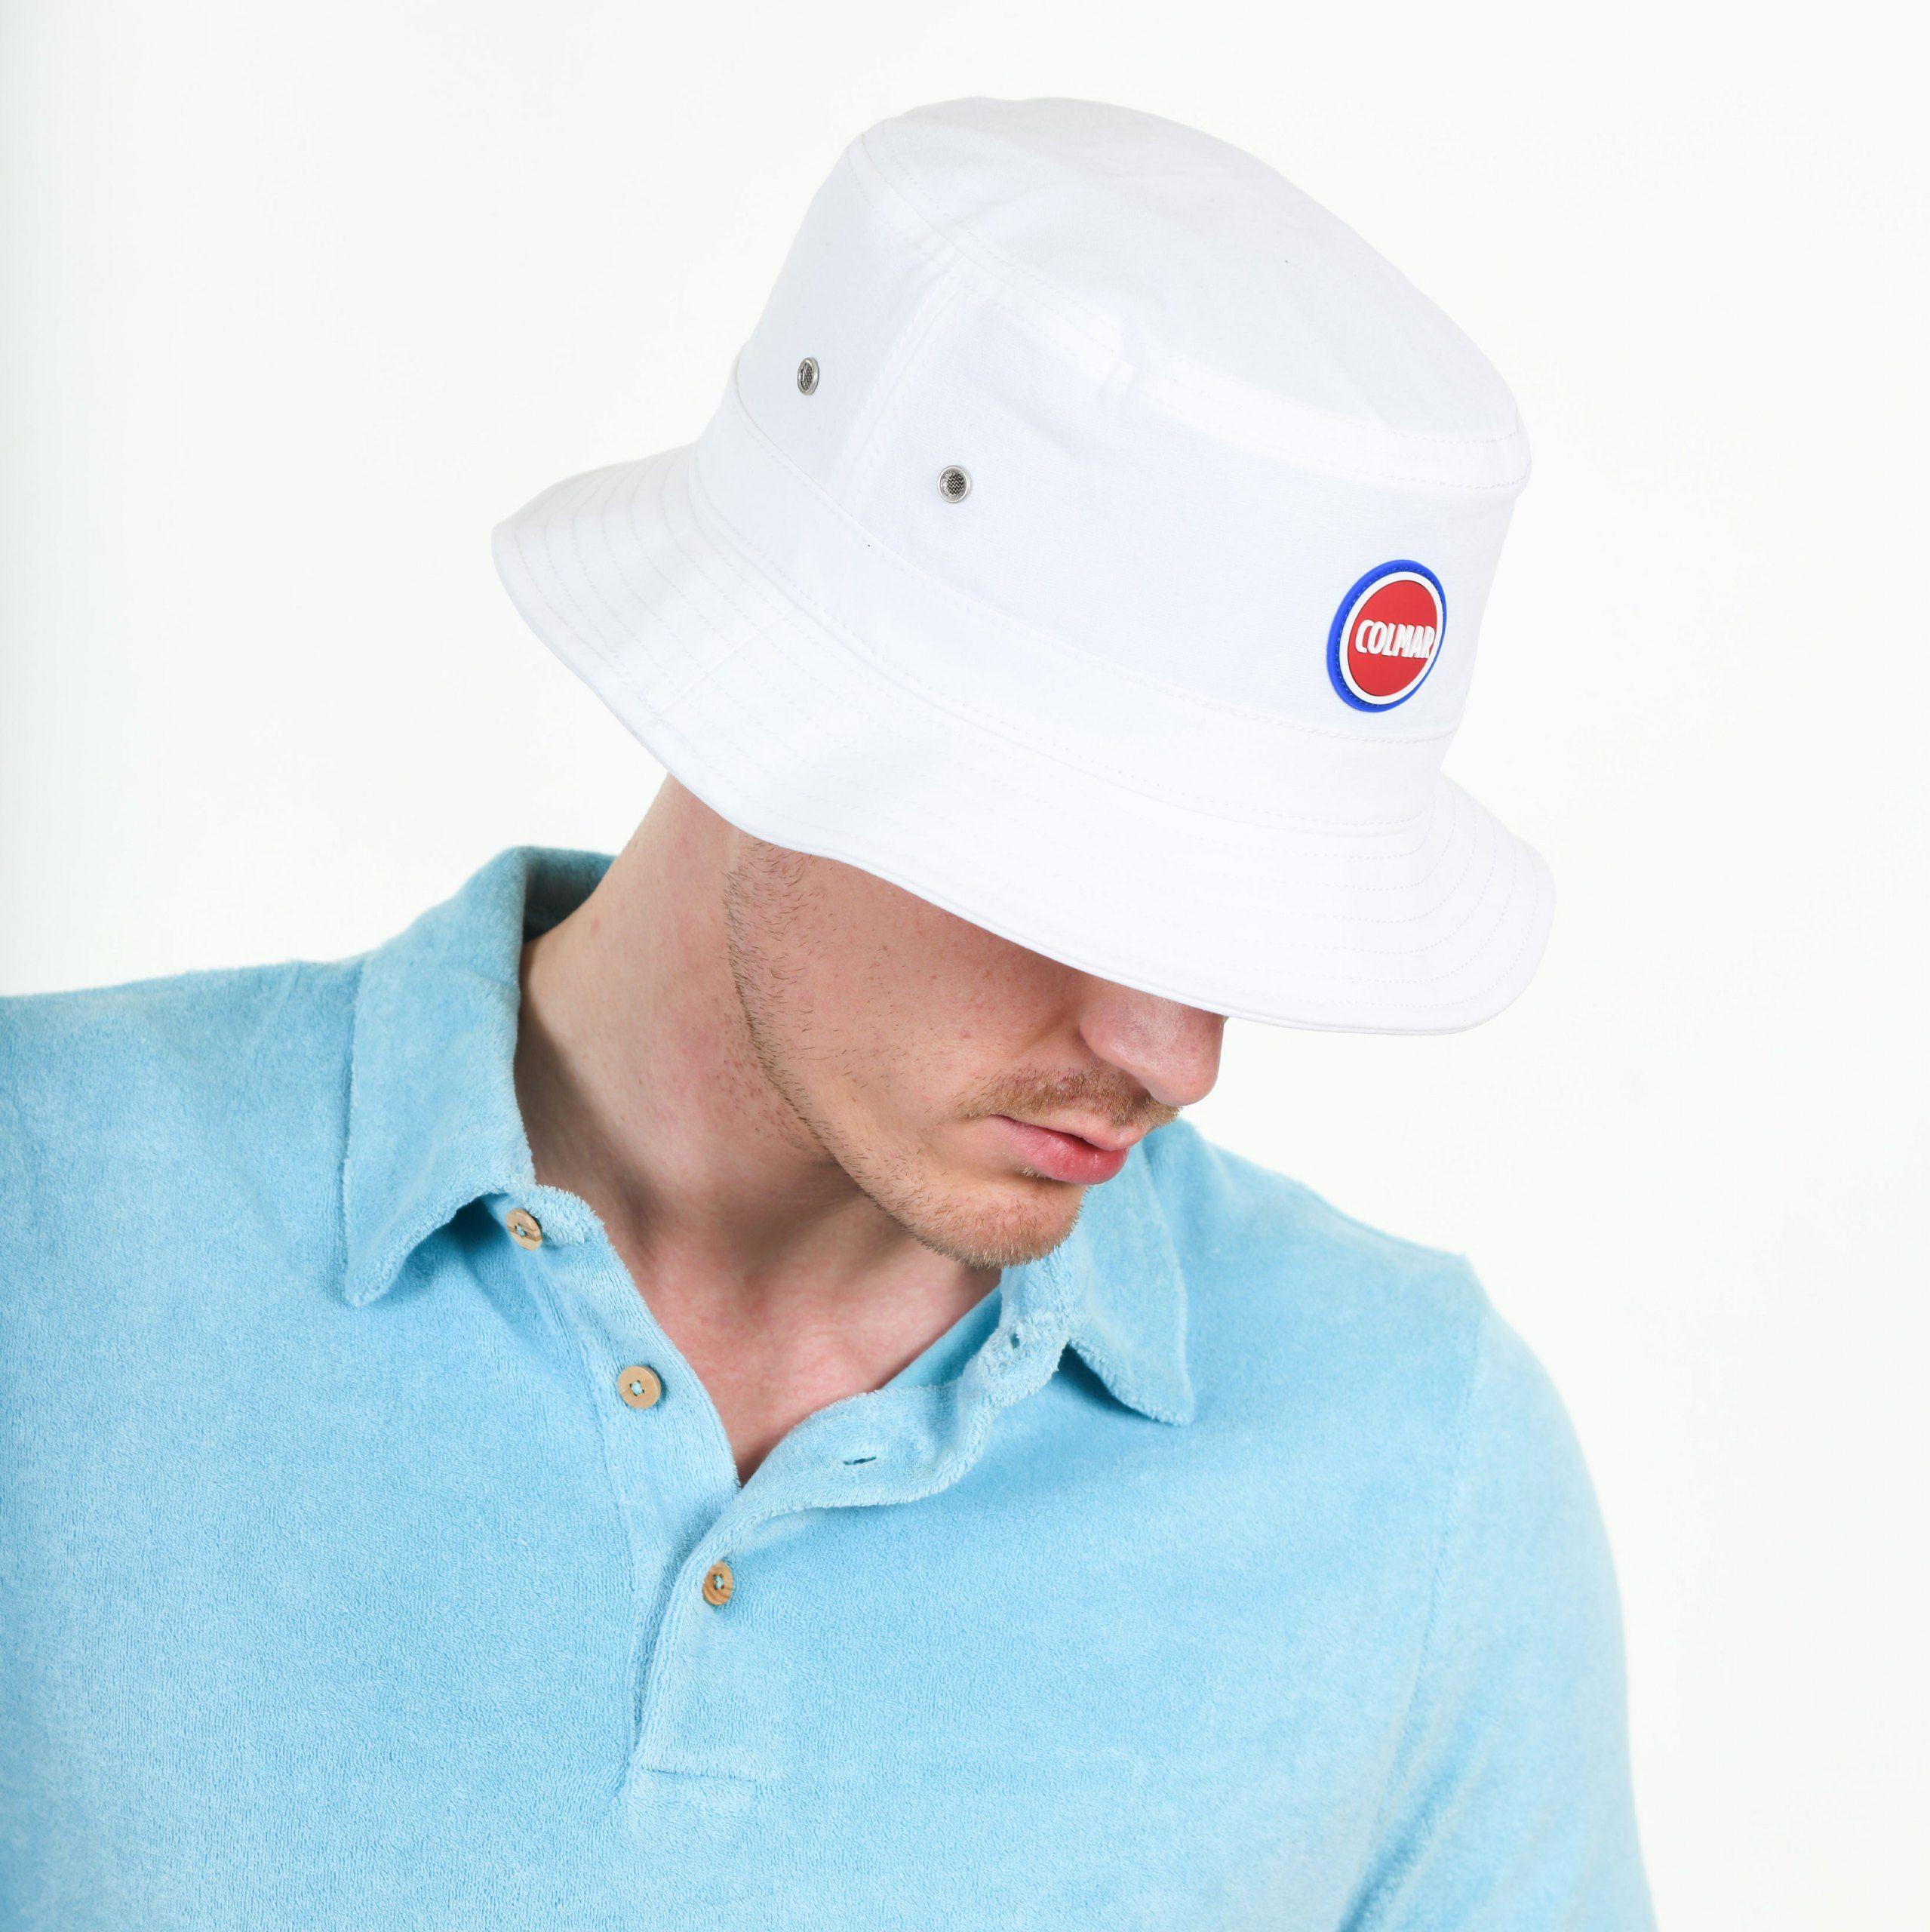 Poloshow Colmar Hat White 01 5074 8WF 4